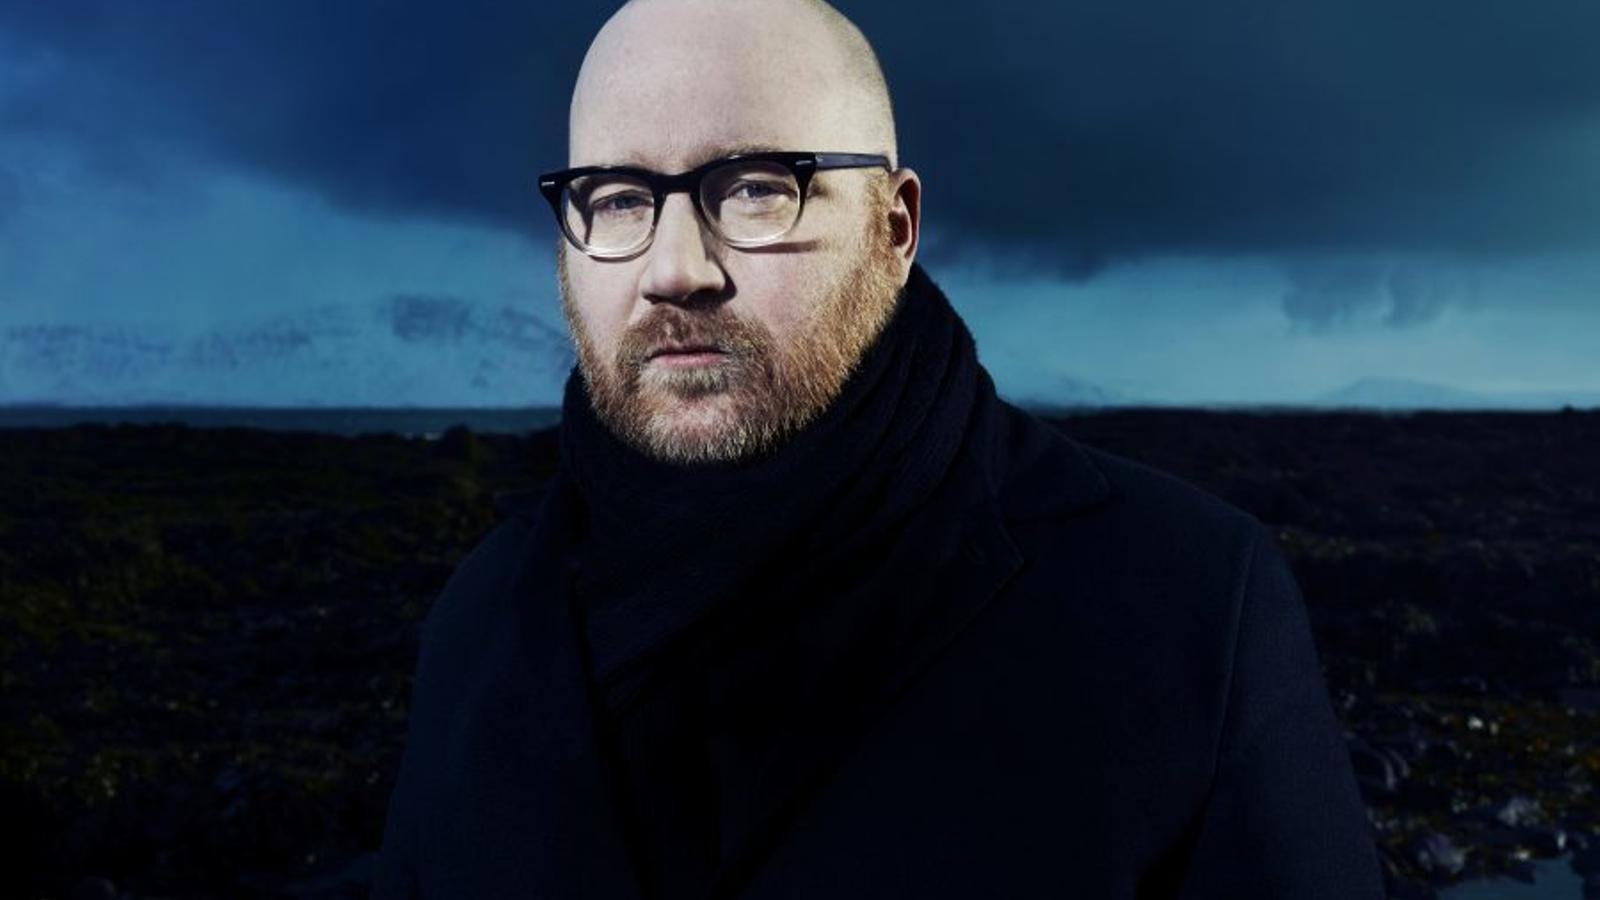 Mor el músic  islandès Jóhann Jóhannsson, autor de la banda sonora de 'Sicario' i 'Theory of Everything'